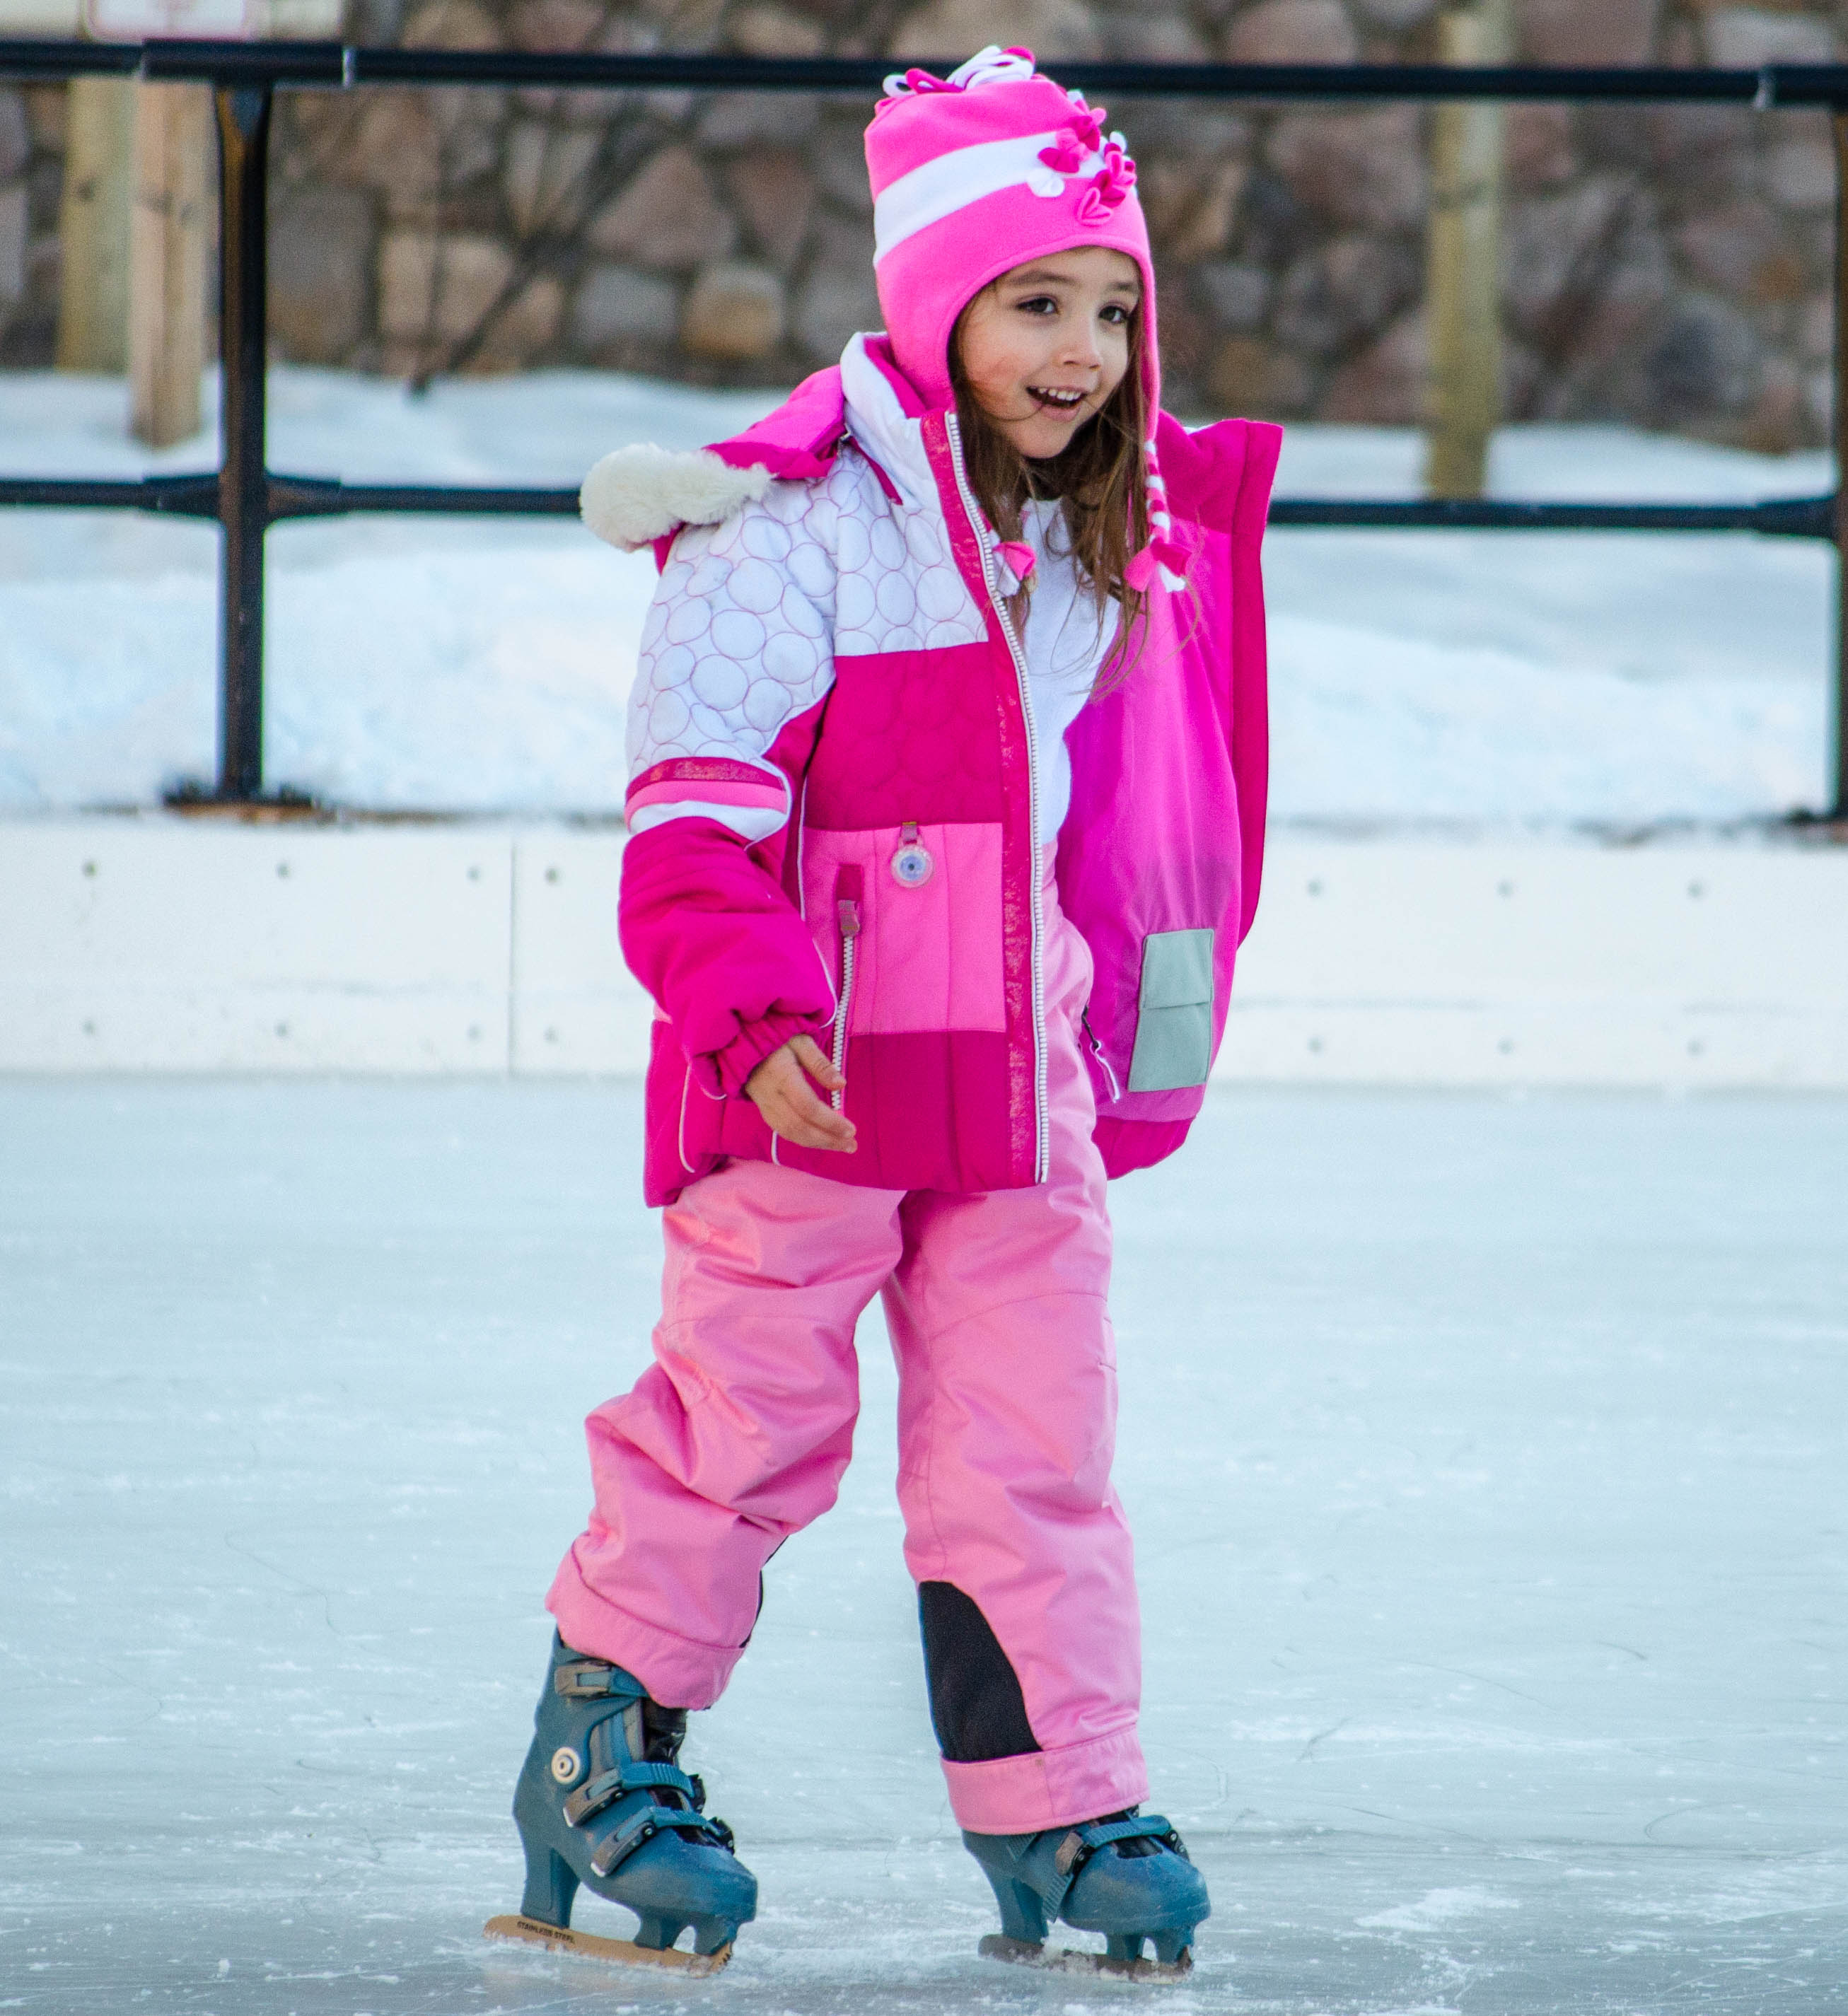 E. Ice Skating